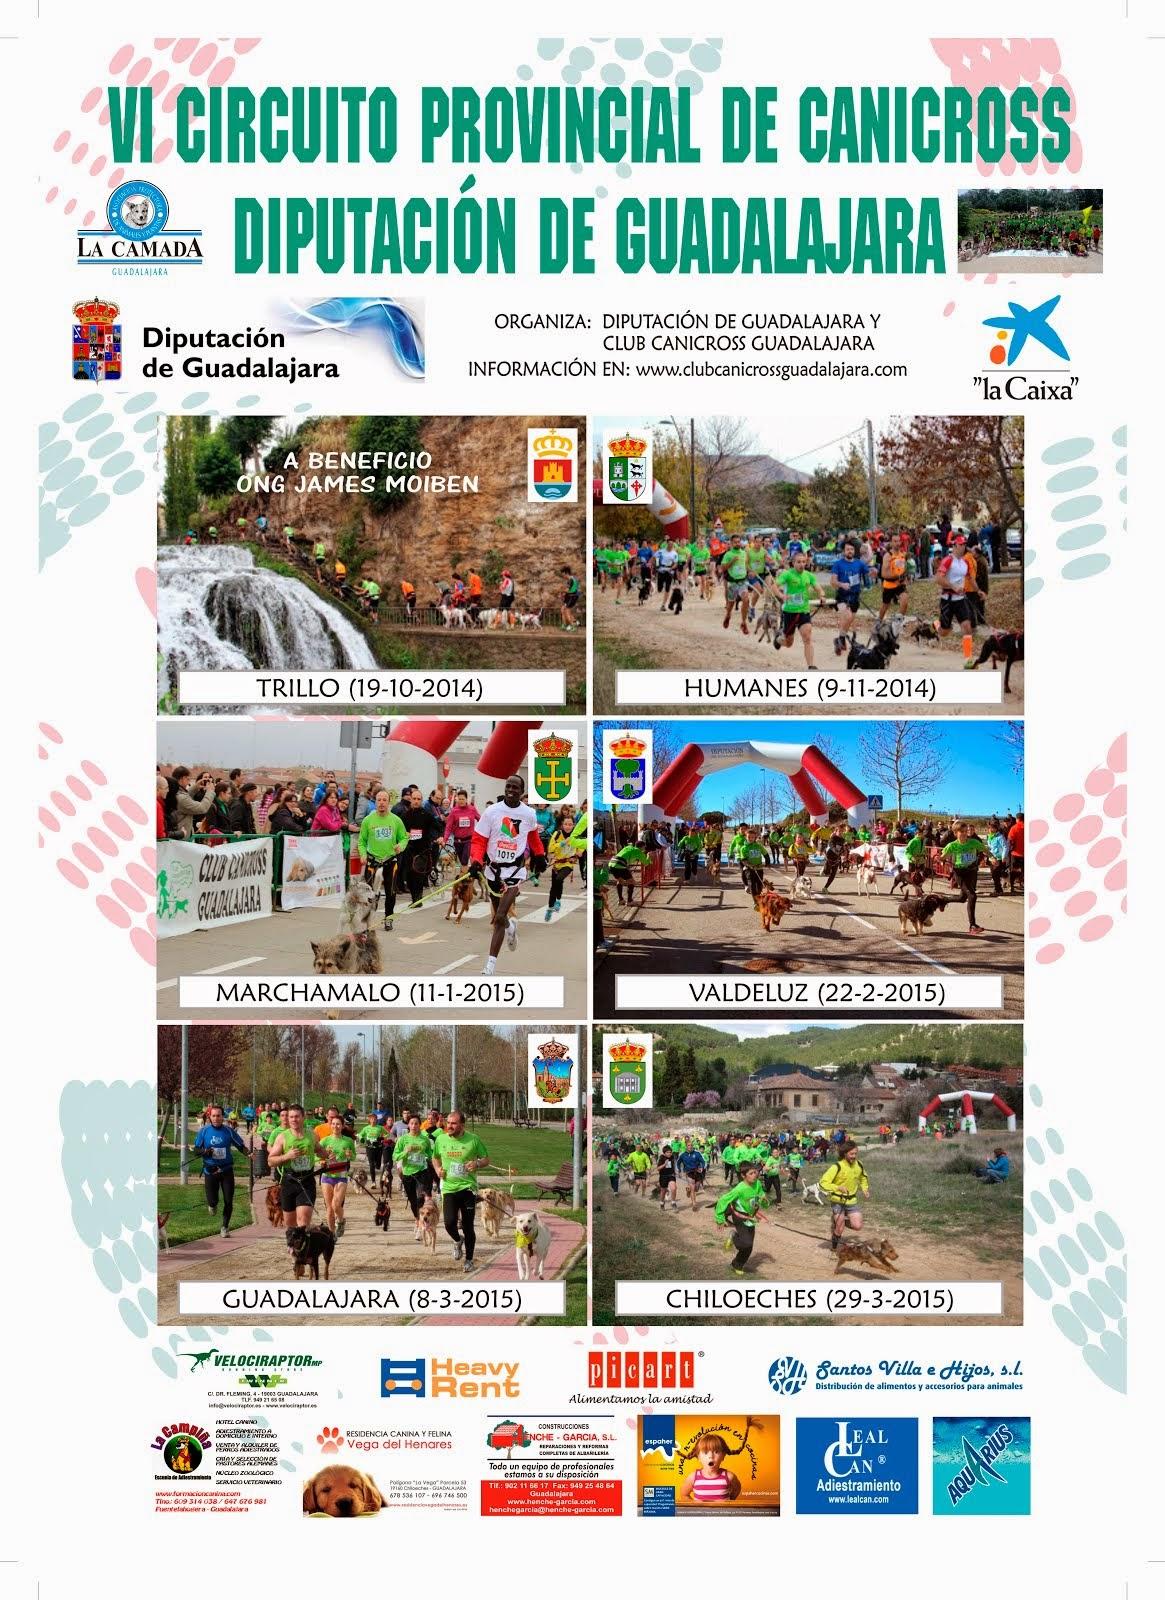 Guadalajara 8-3-2015, Cpto de clubes Postercircuito1415